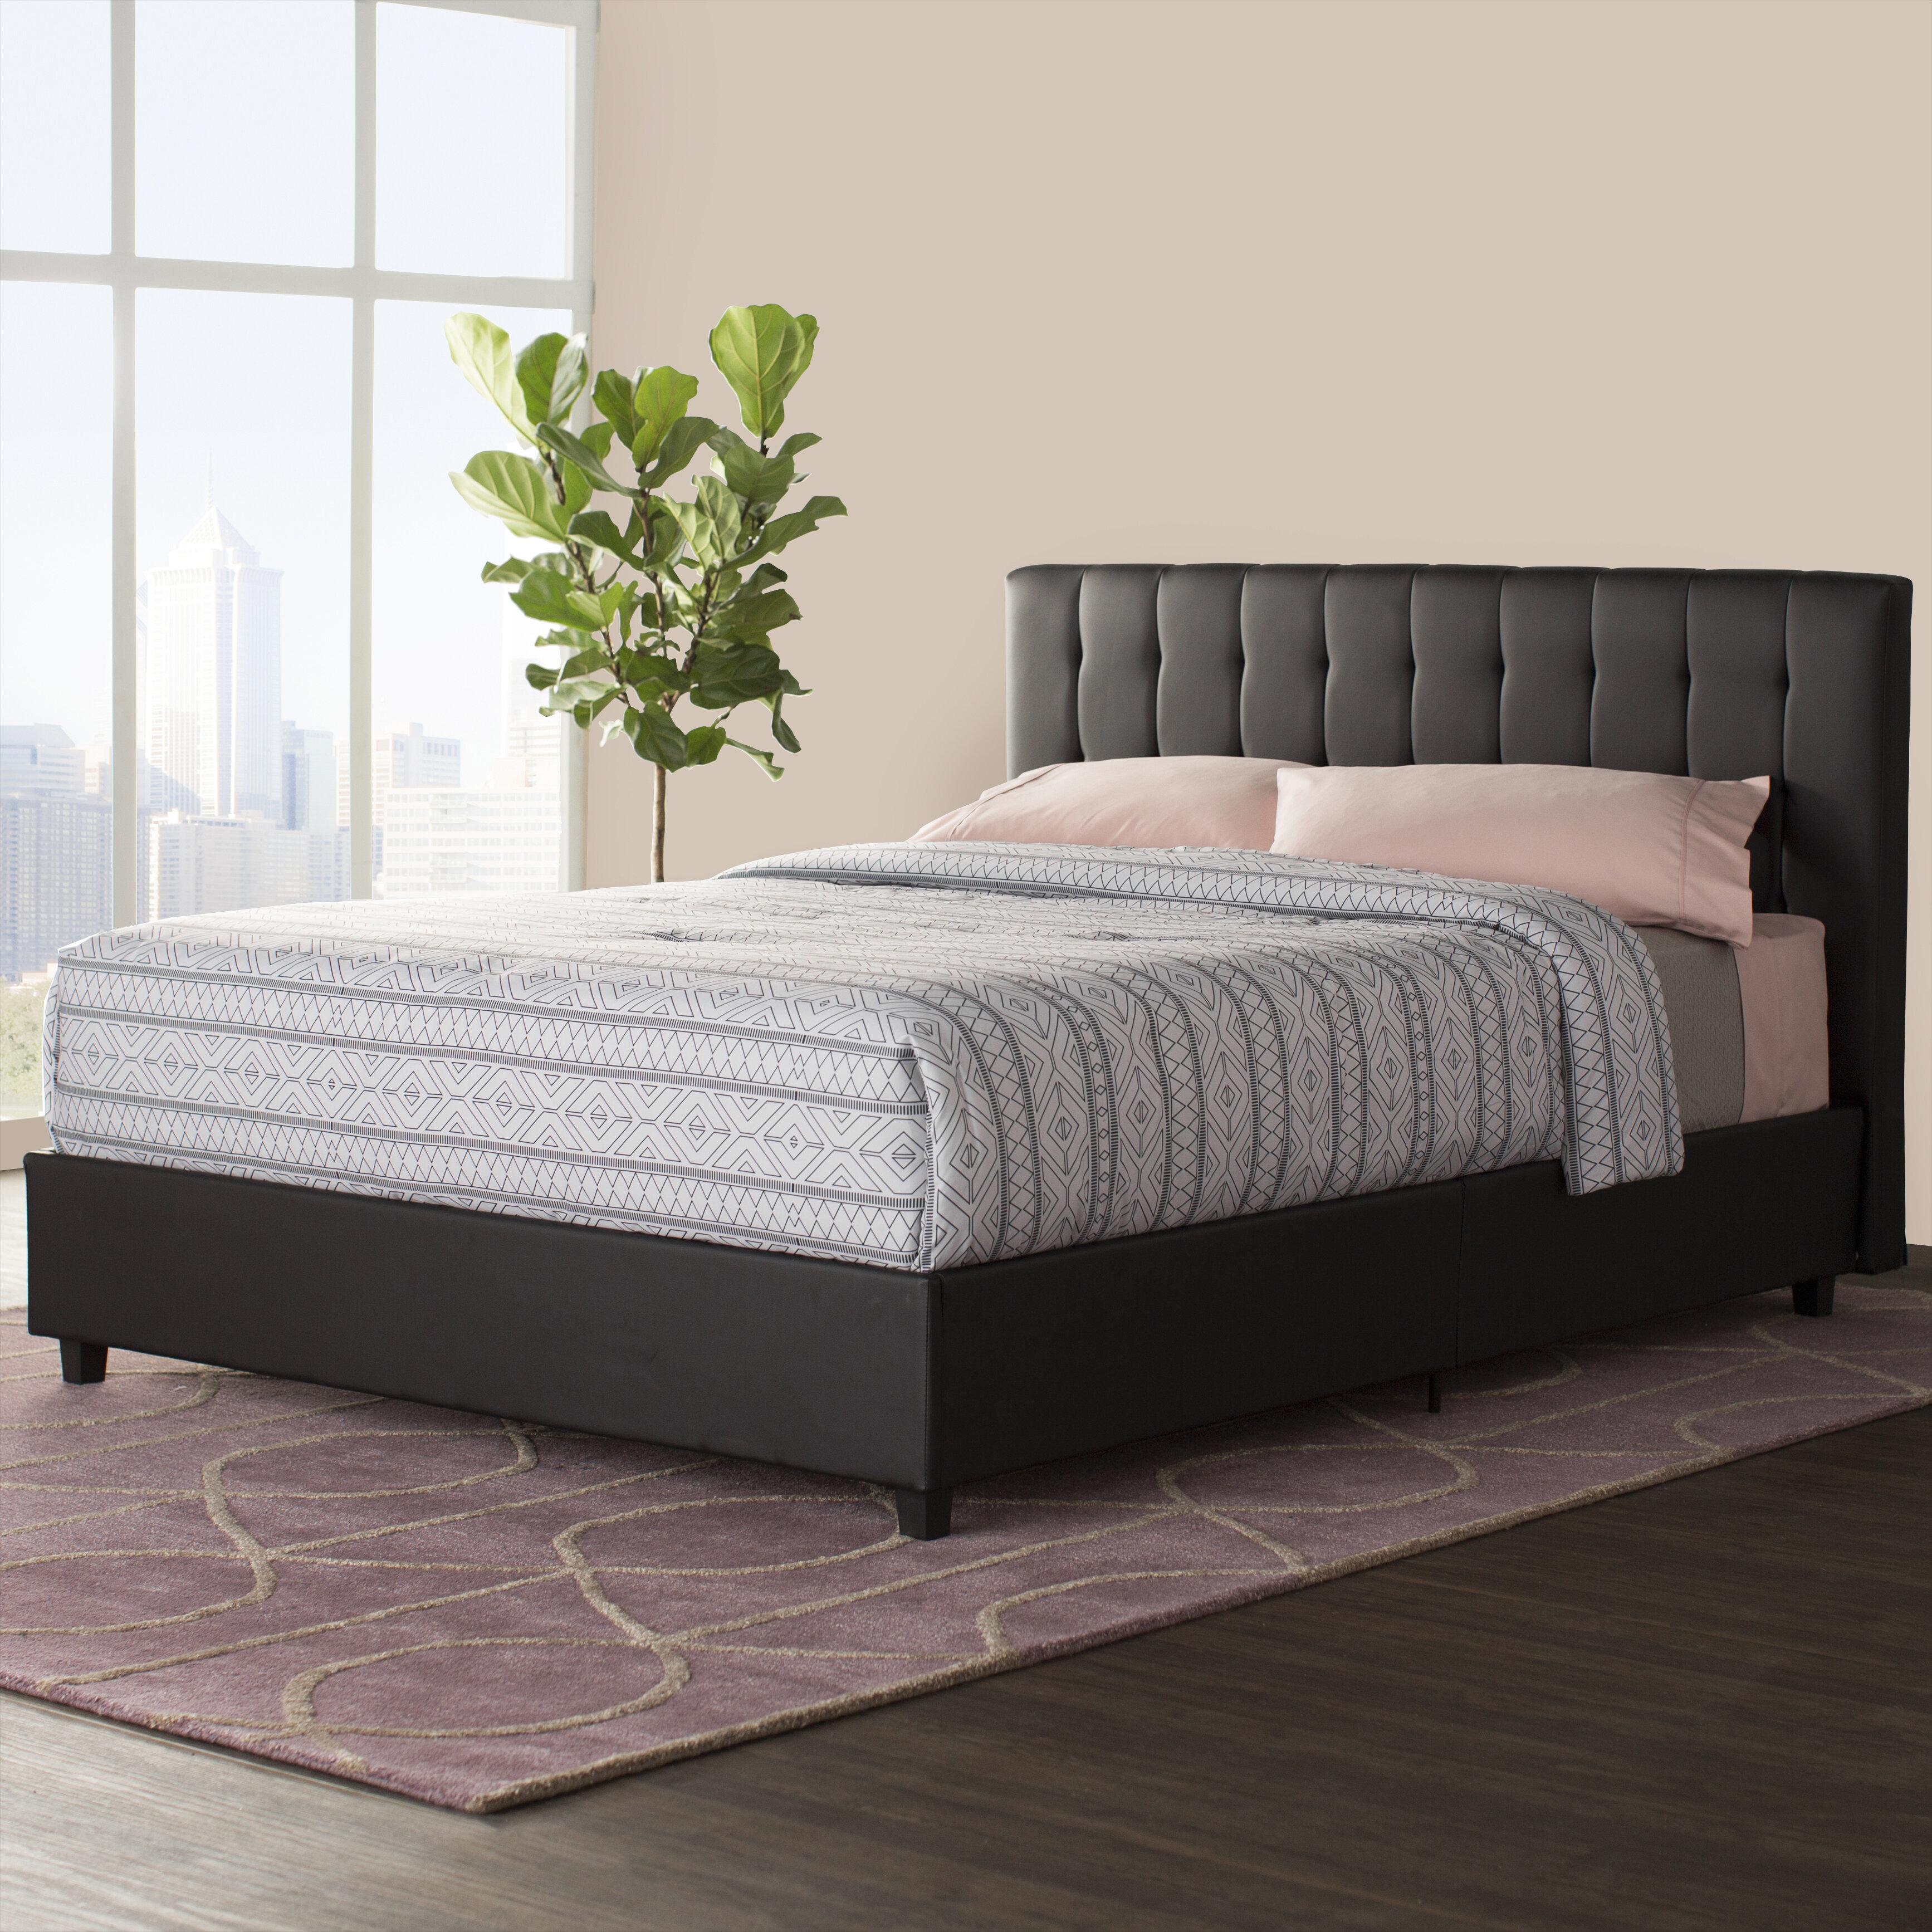 Wade Logan Littrell Upholstered Platform Bed Reviews Wayfair - Logan-leather-bed-with-adjustable-headboard